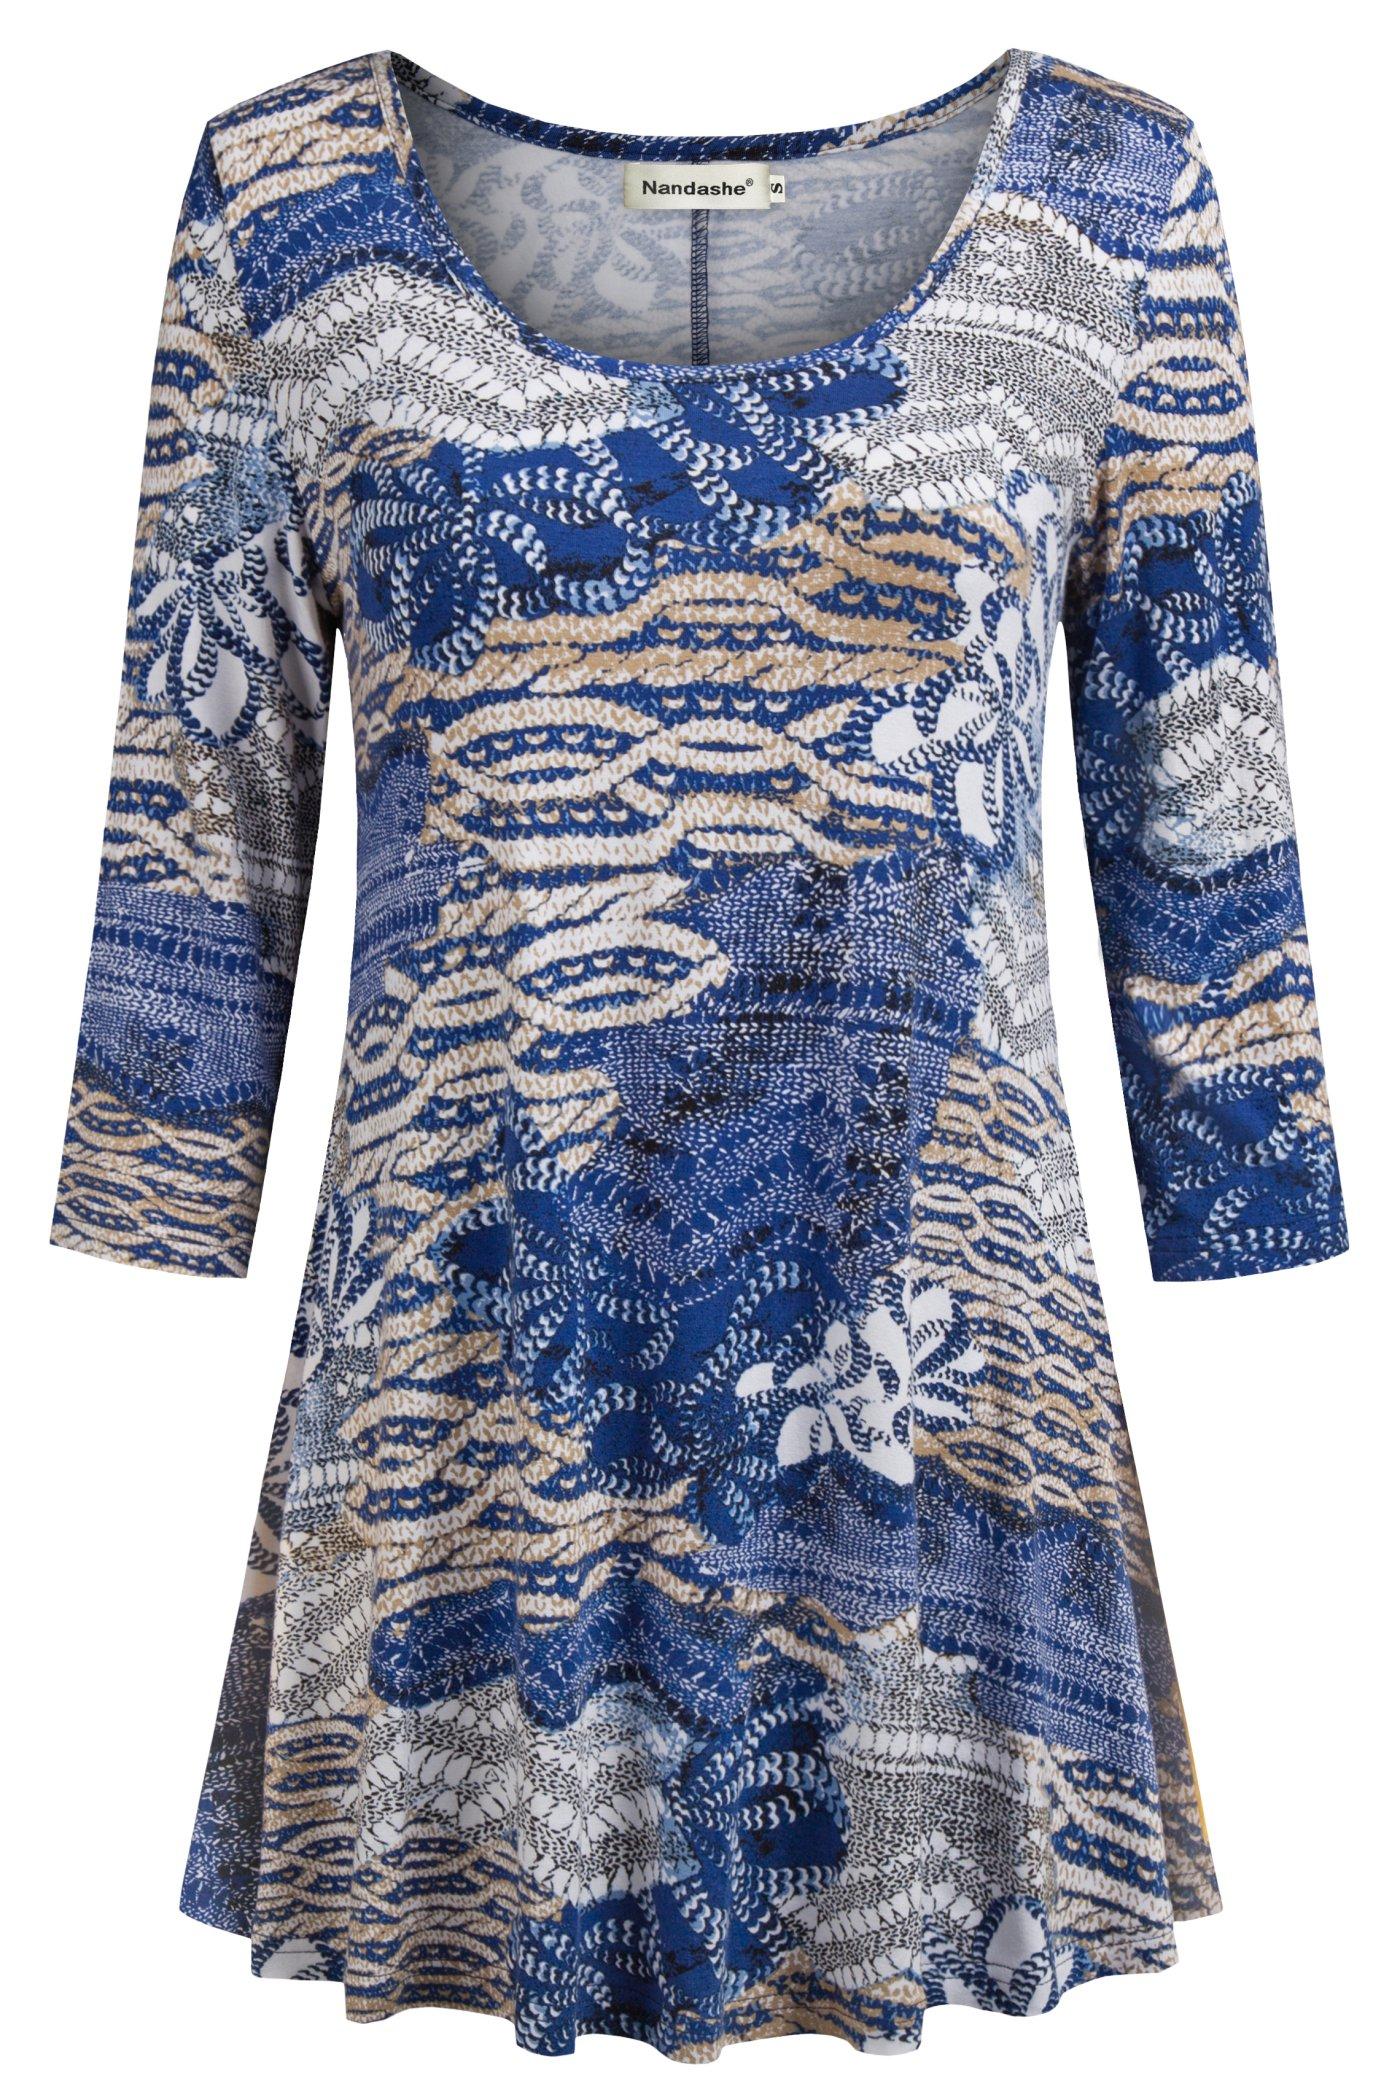 Nandashe Casual Tunic Shirt,Women 3 4 Sleeves Crewneck Nice Flower Print Slim Paisley Pattern Country Style Plain Cozy Pleat Pullover Drape Boho Blouses Blue Beige XXL